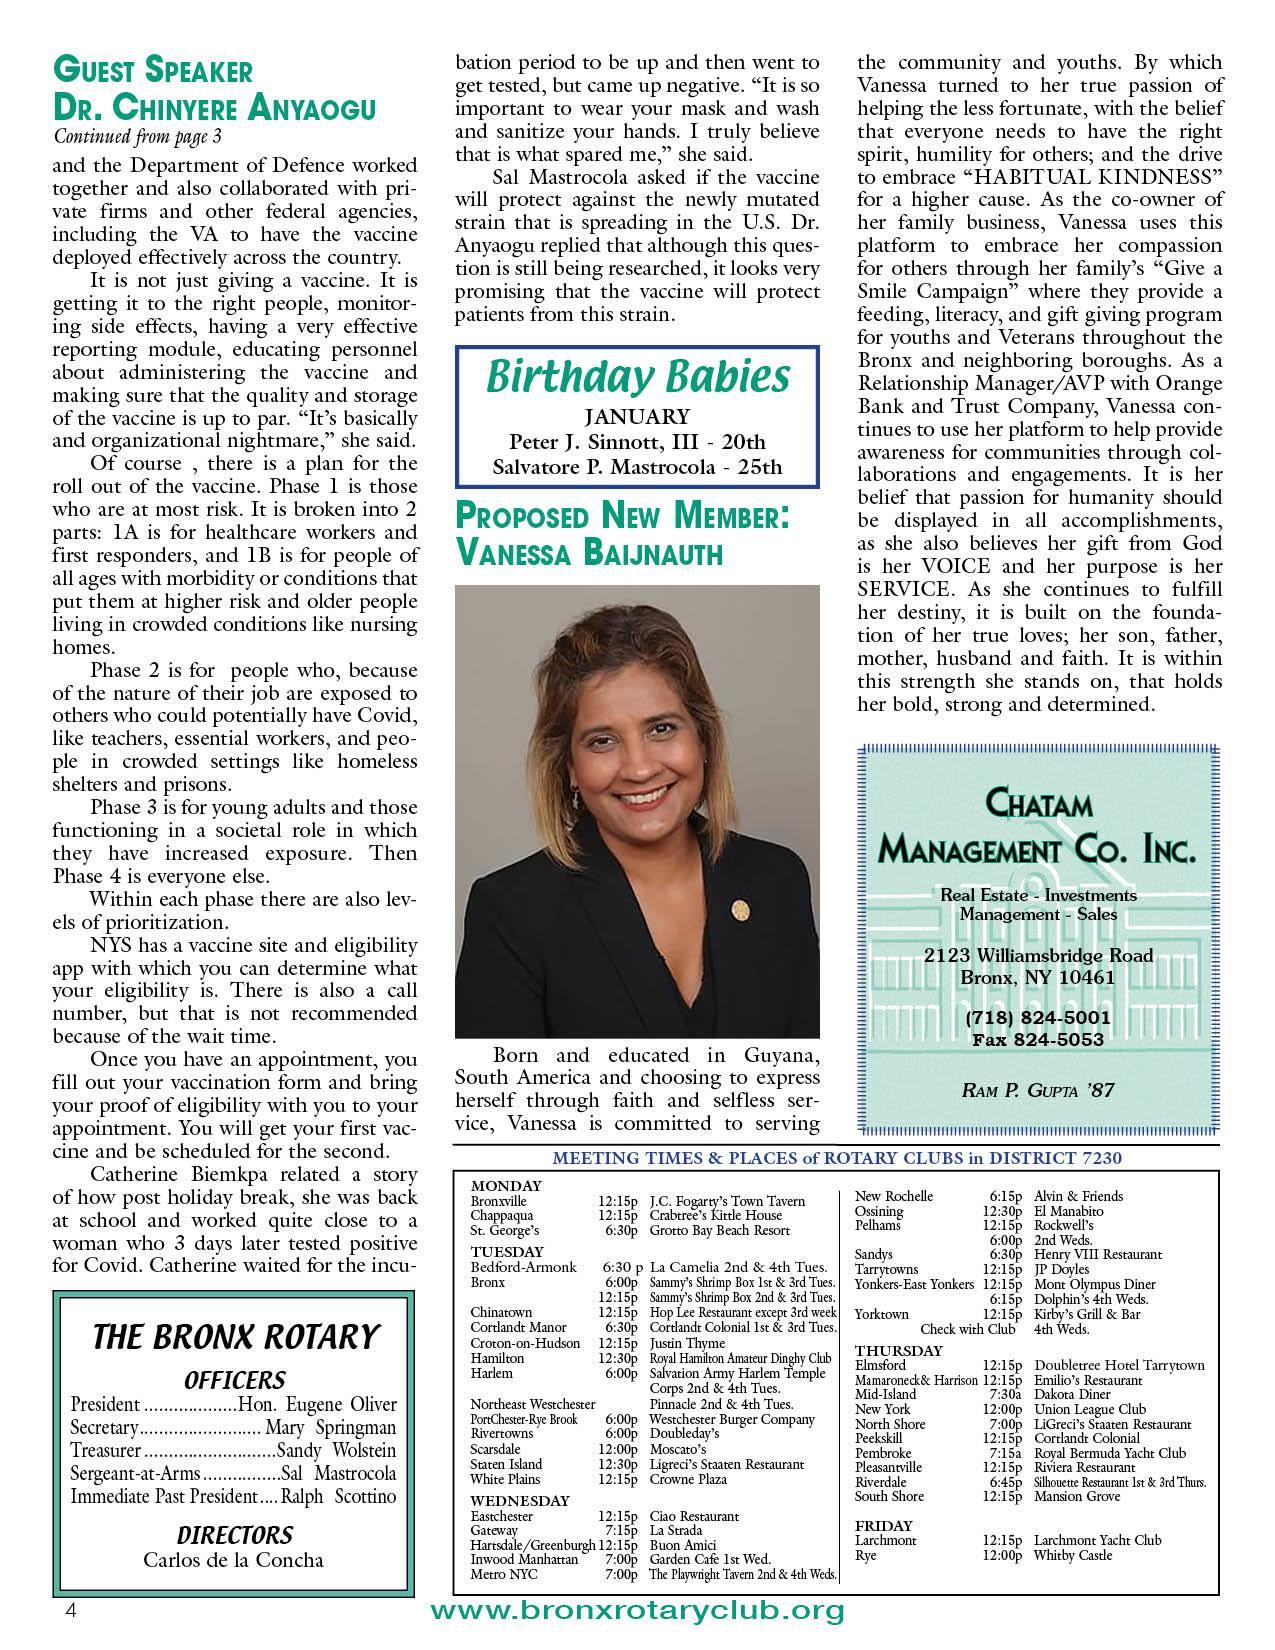 Tuesdays newsletter 1/12 & 1/19/2021 p4